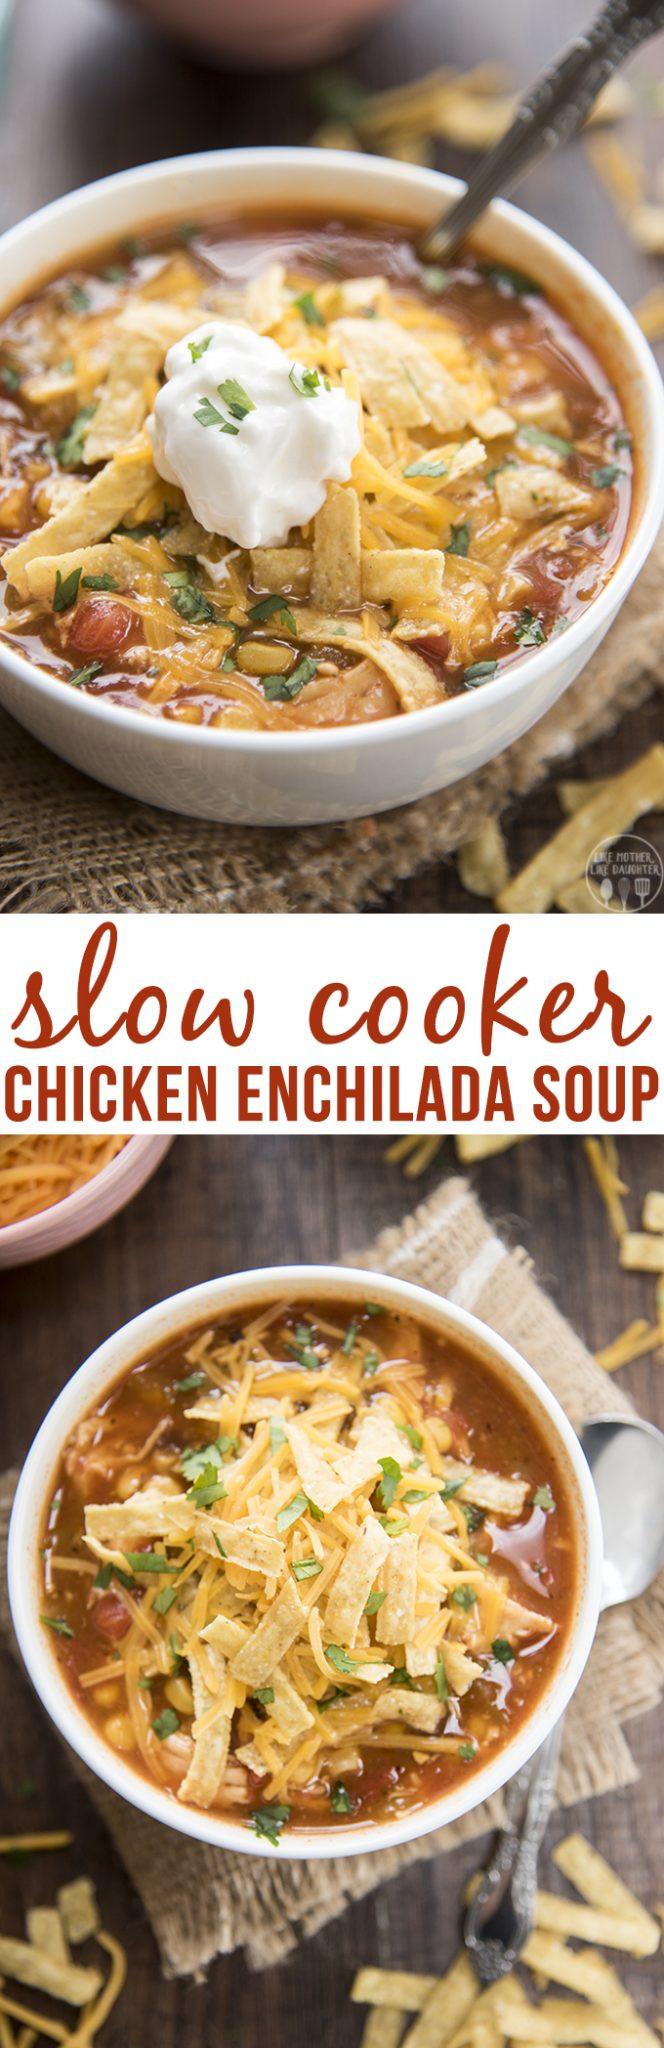 Slow Cooker Chicken Enchiladas  Slow Cooker Chicken Enchilada Soup – Like Mother Like